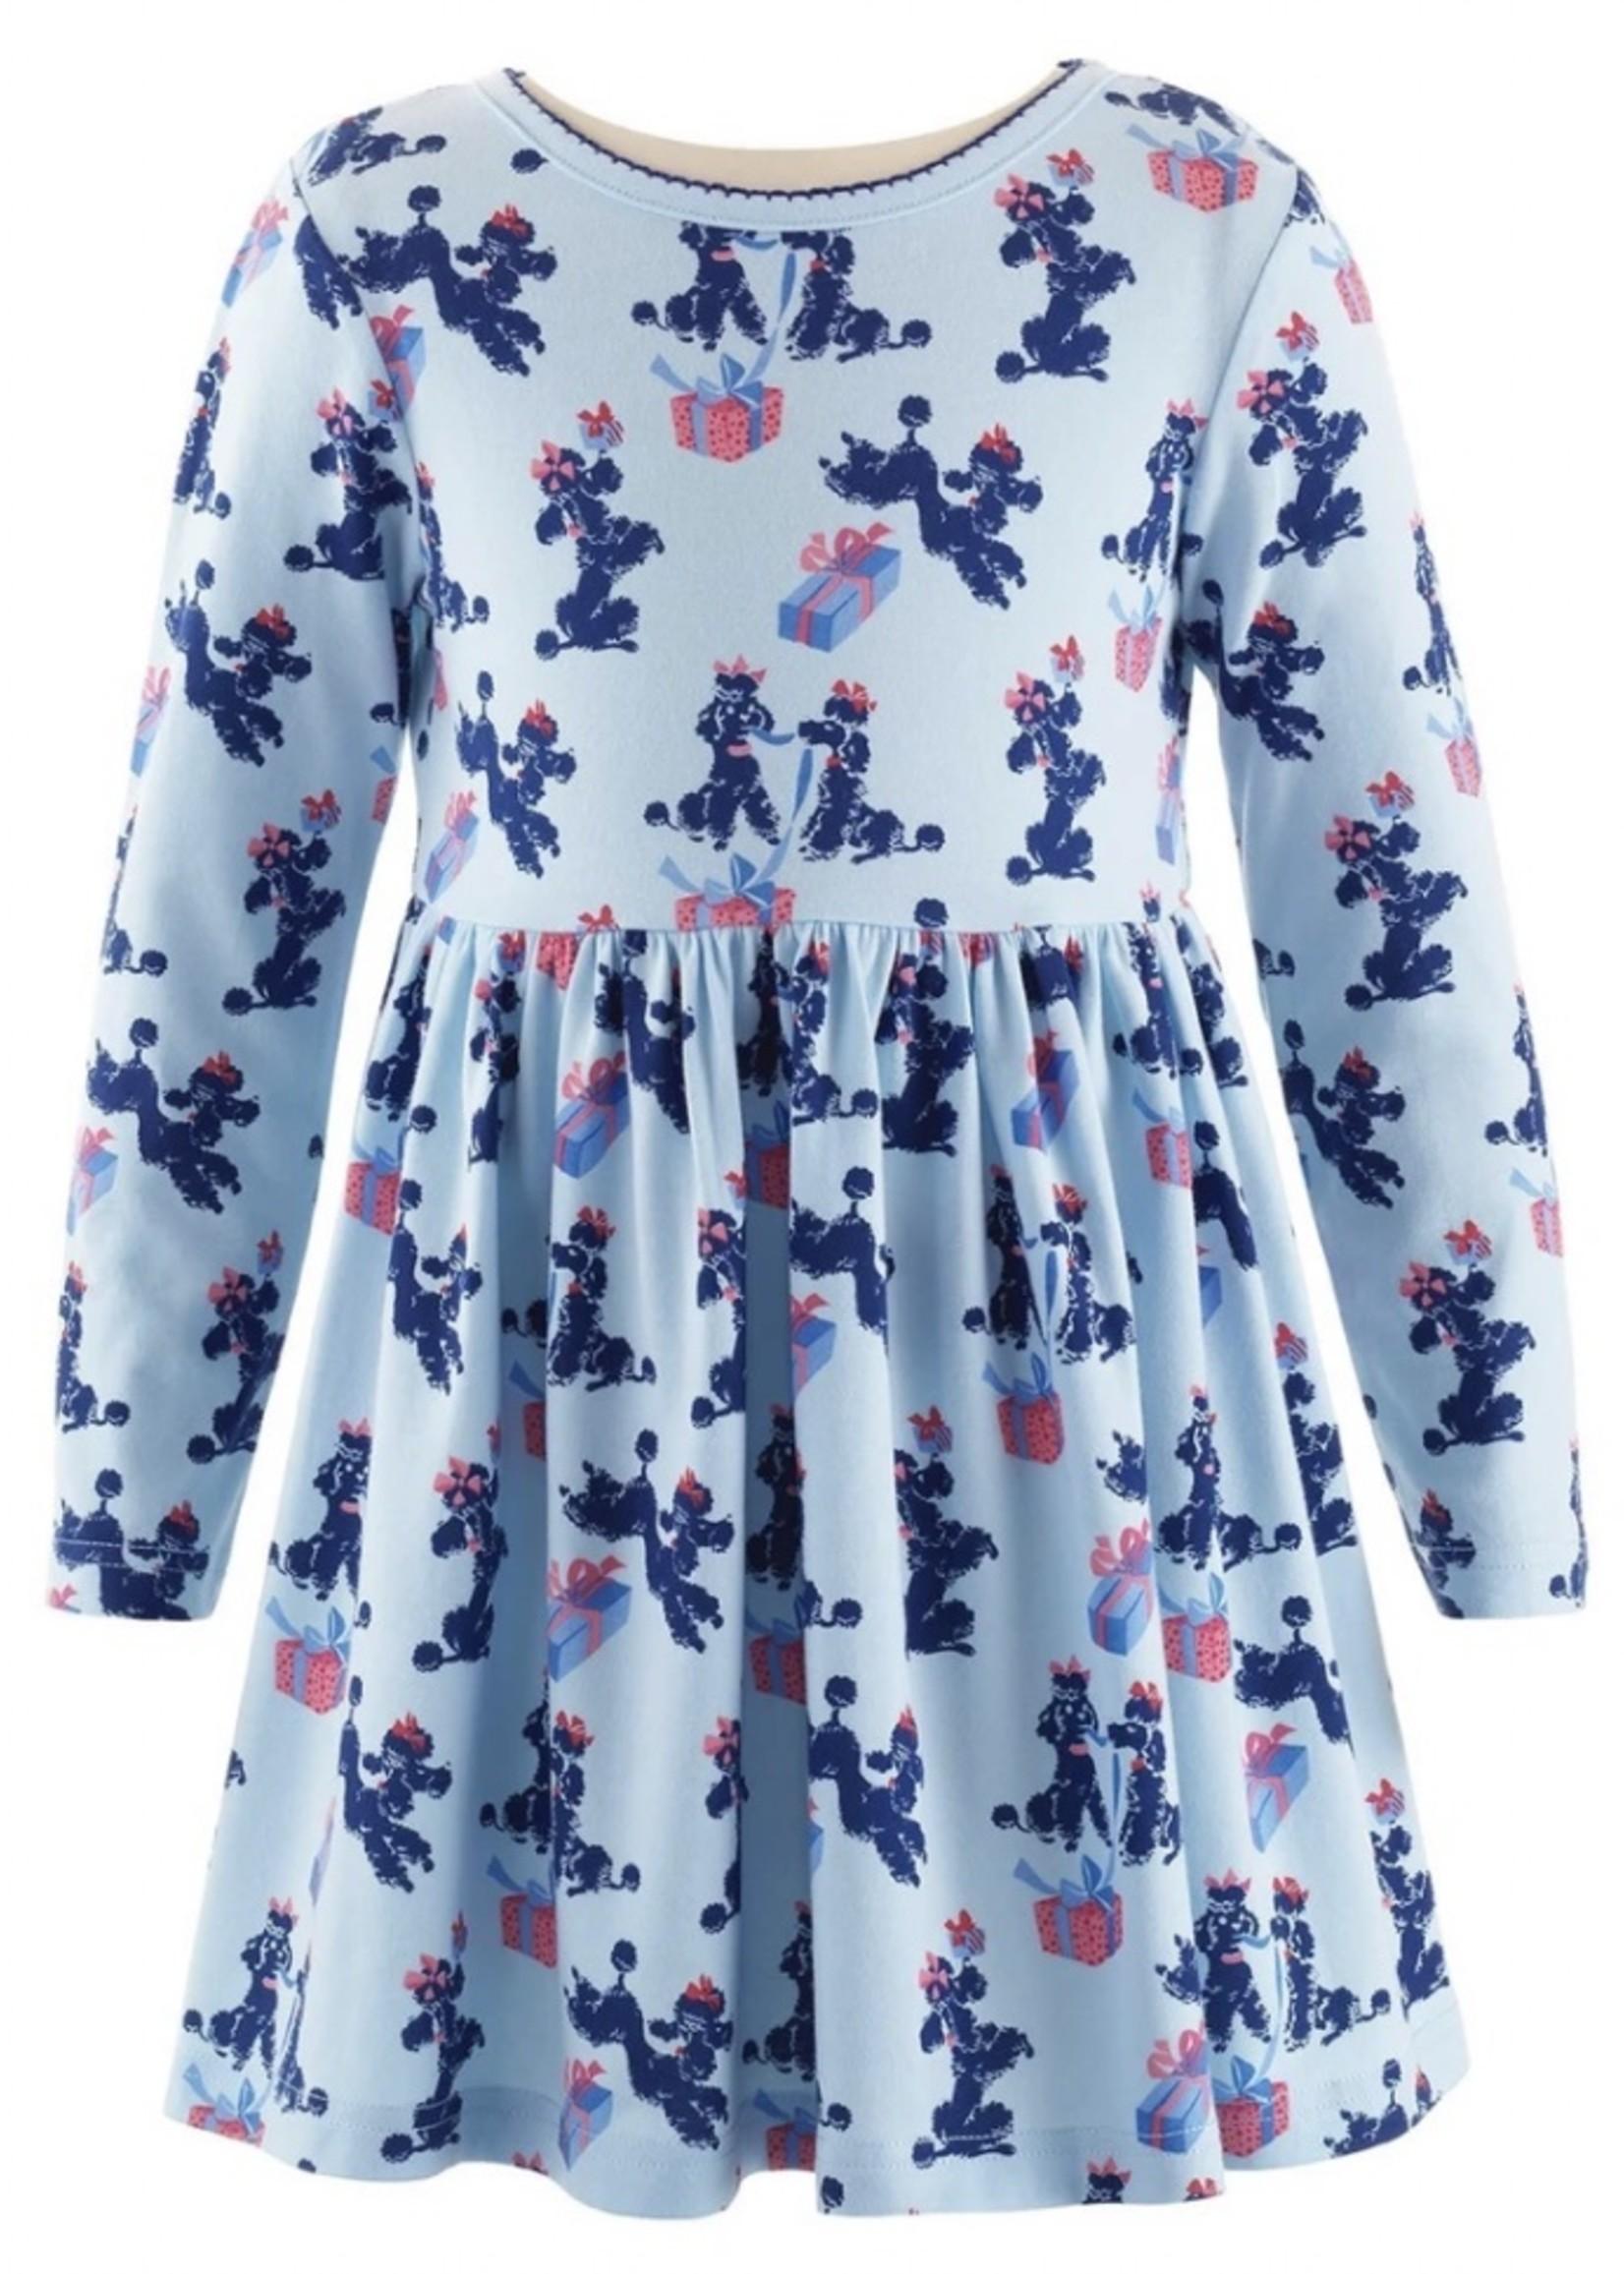 Poodle Jersey Dress Blue